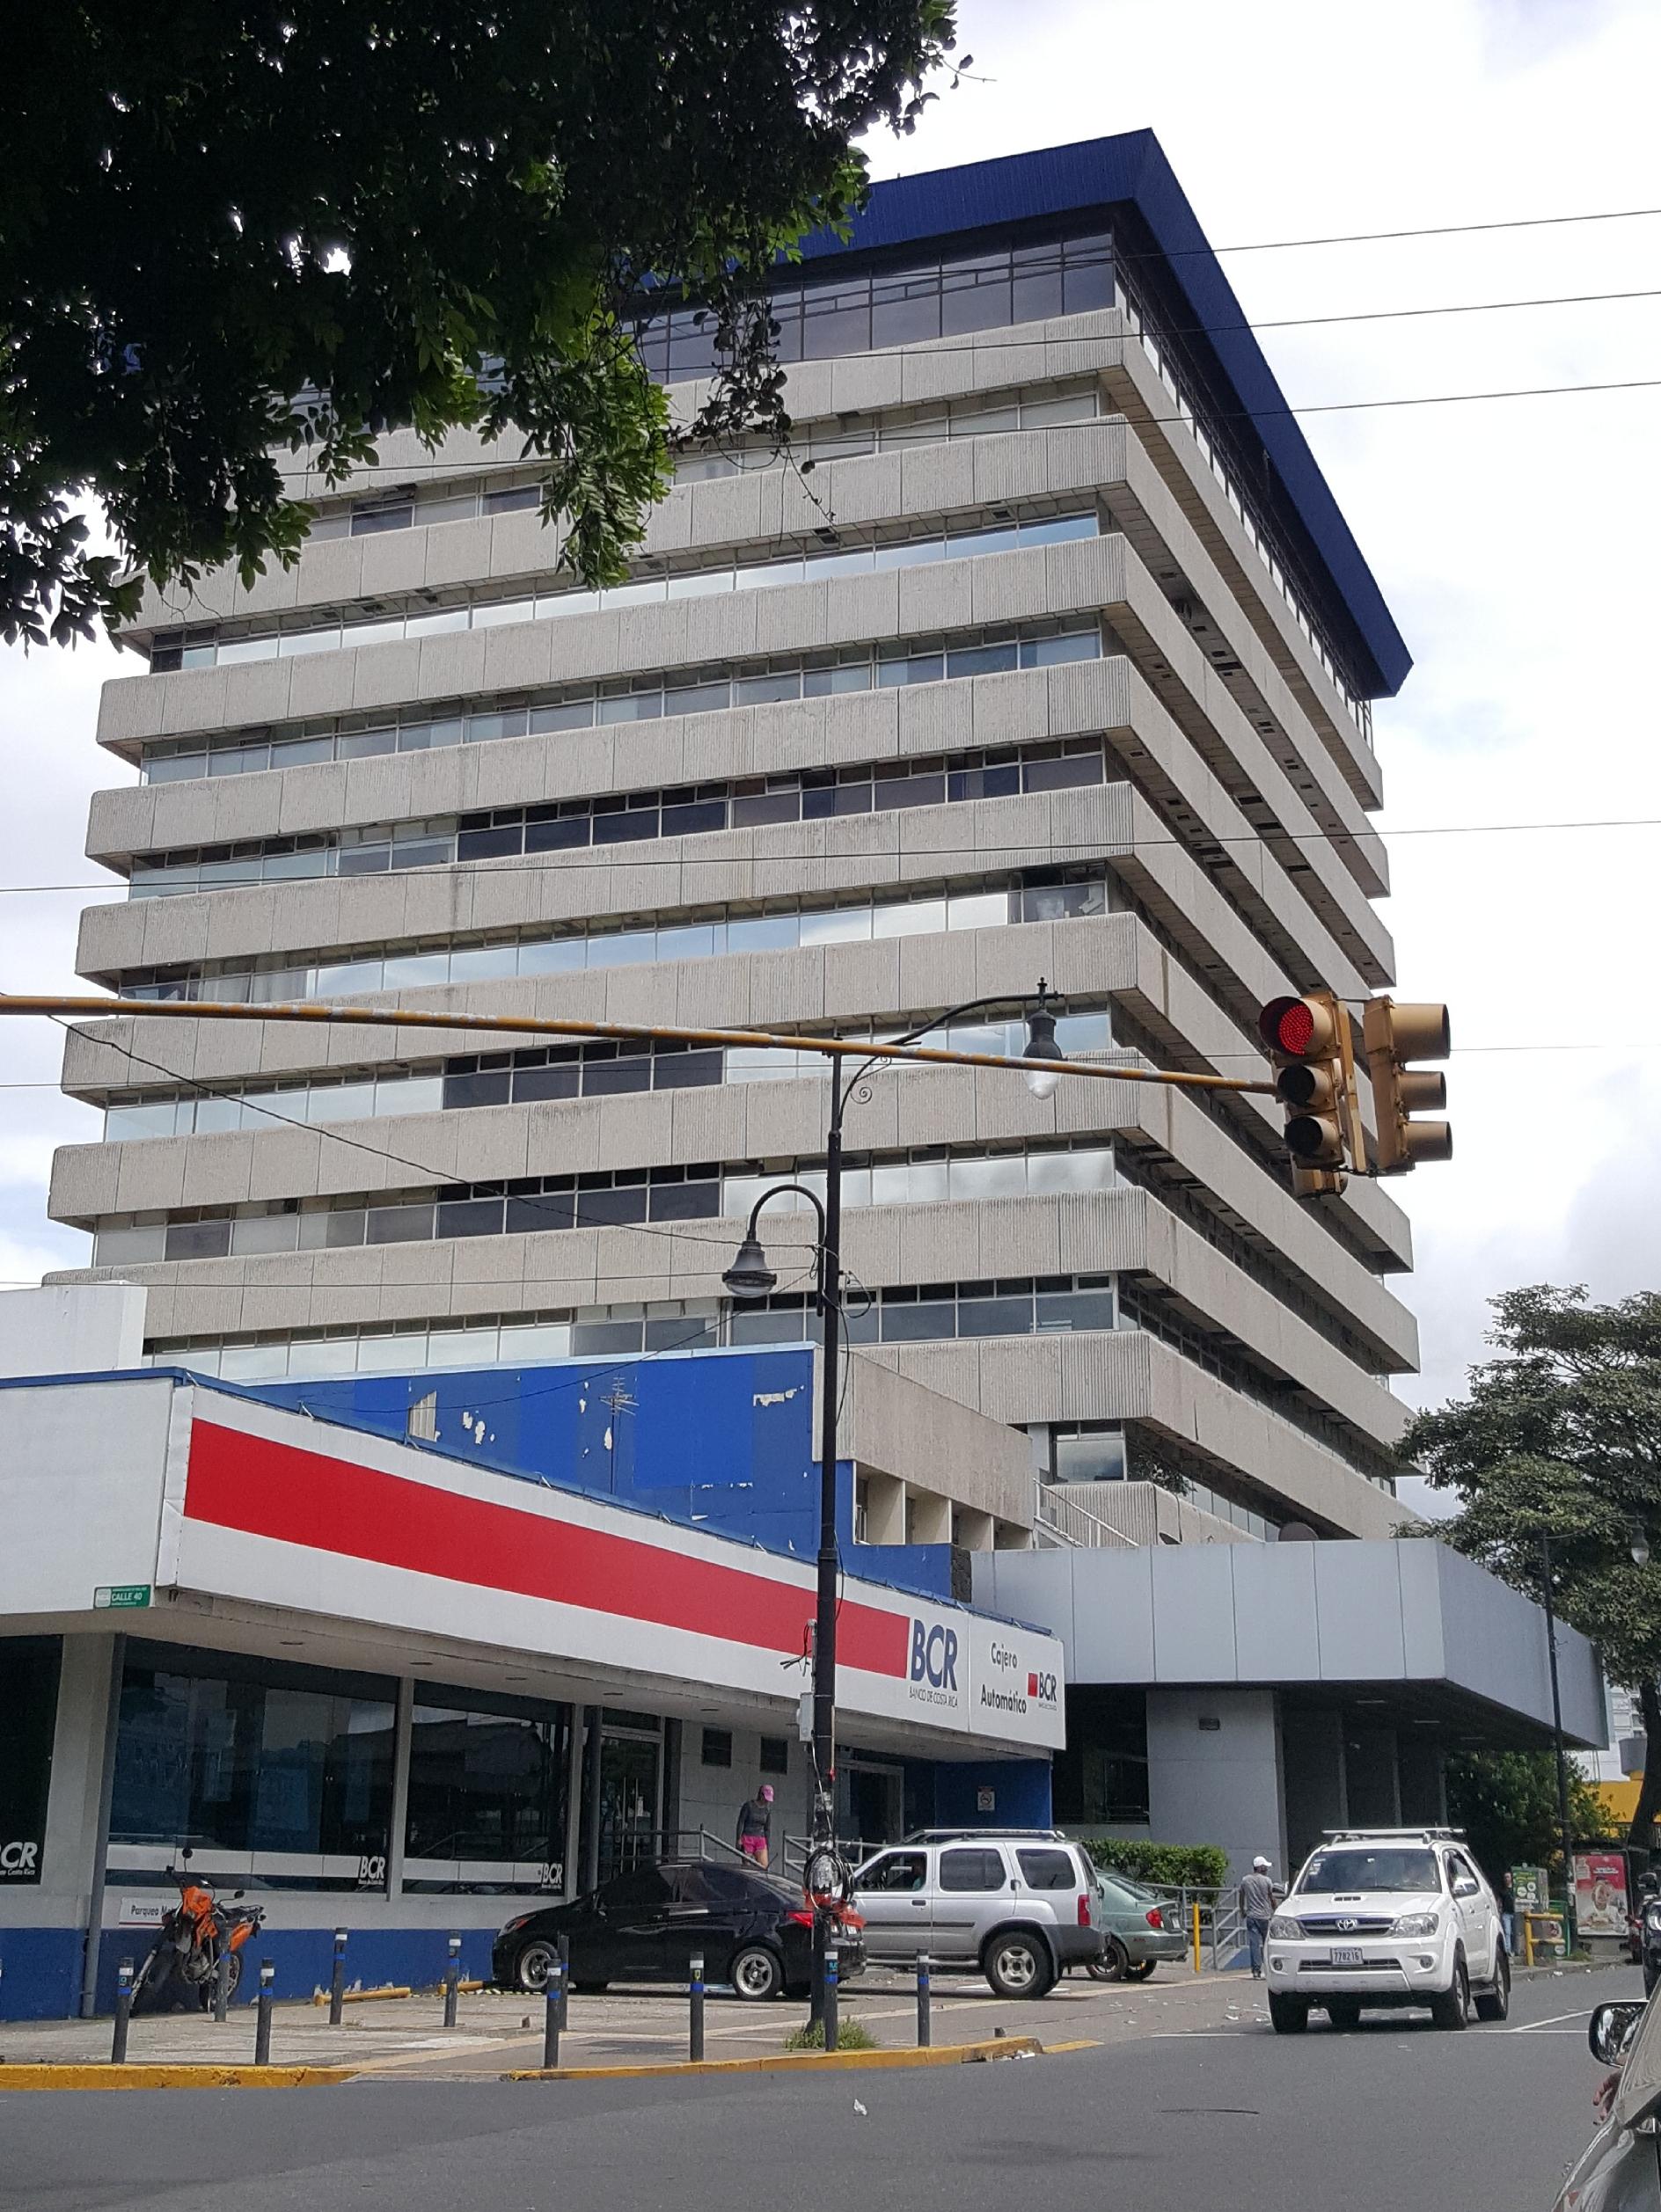 Archivo:Edificio Centro Colón.jpg - Wikipedia, la enciclopedia libre